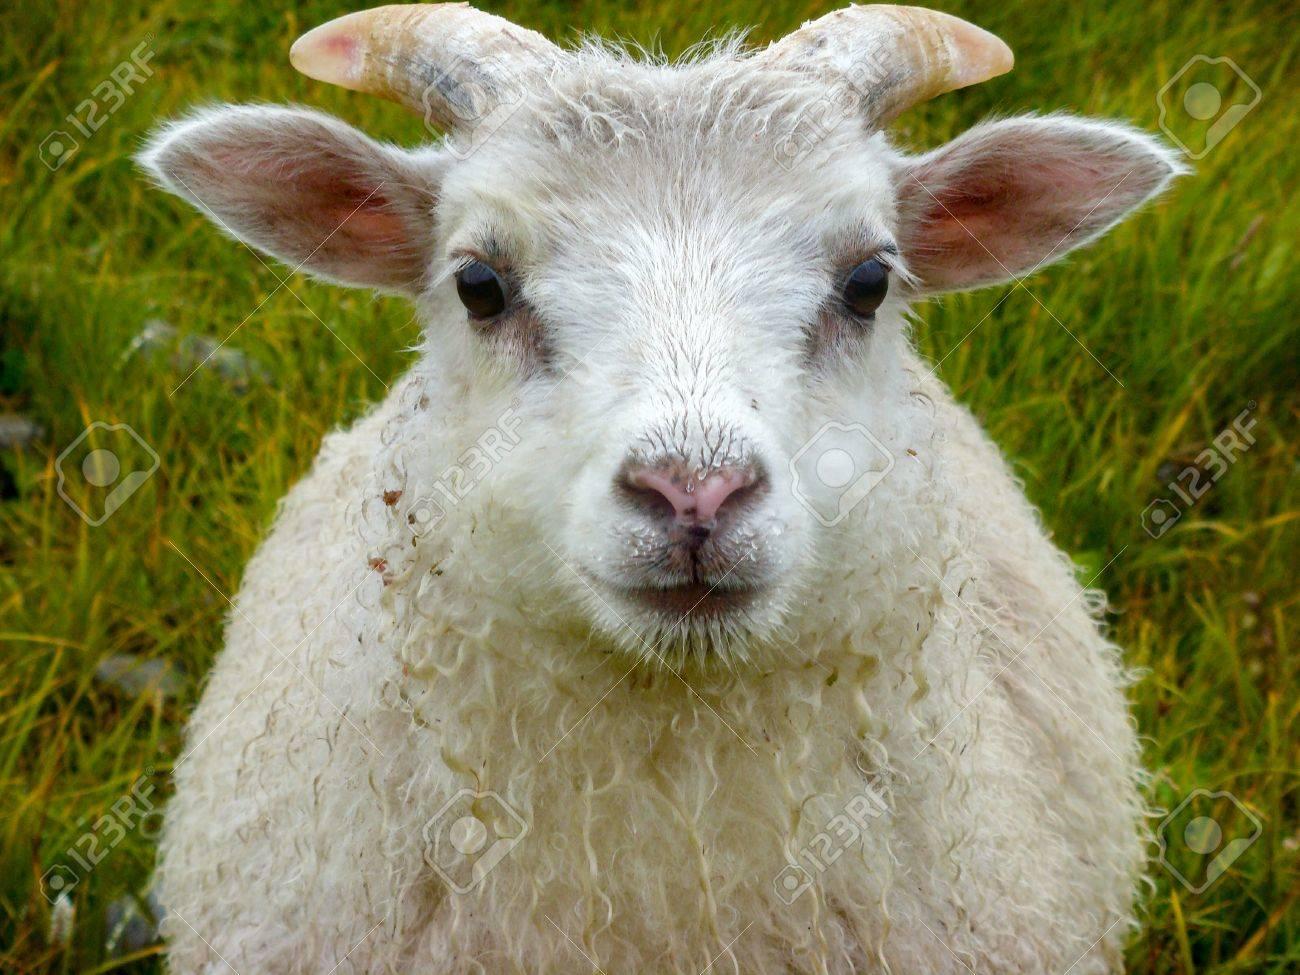 newborn baby white ram sheep under the rain and grass background stock photo picture and royalty free image image 87164708 newborn baby white ram sheep under the rain and grass background